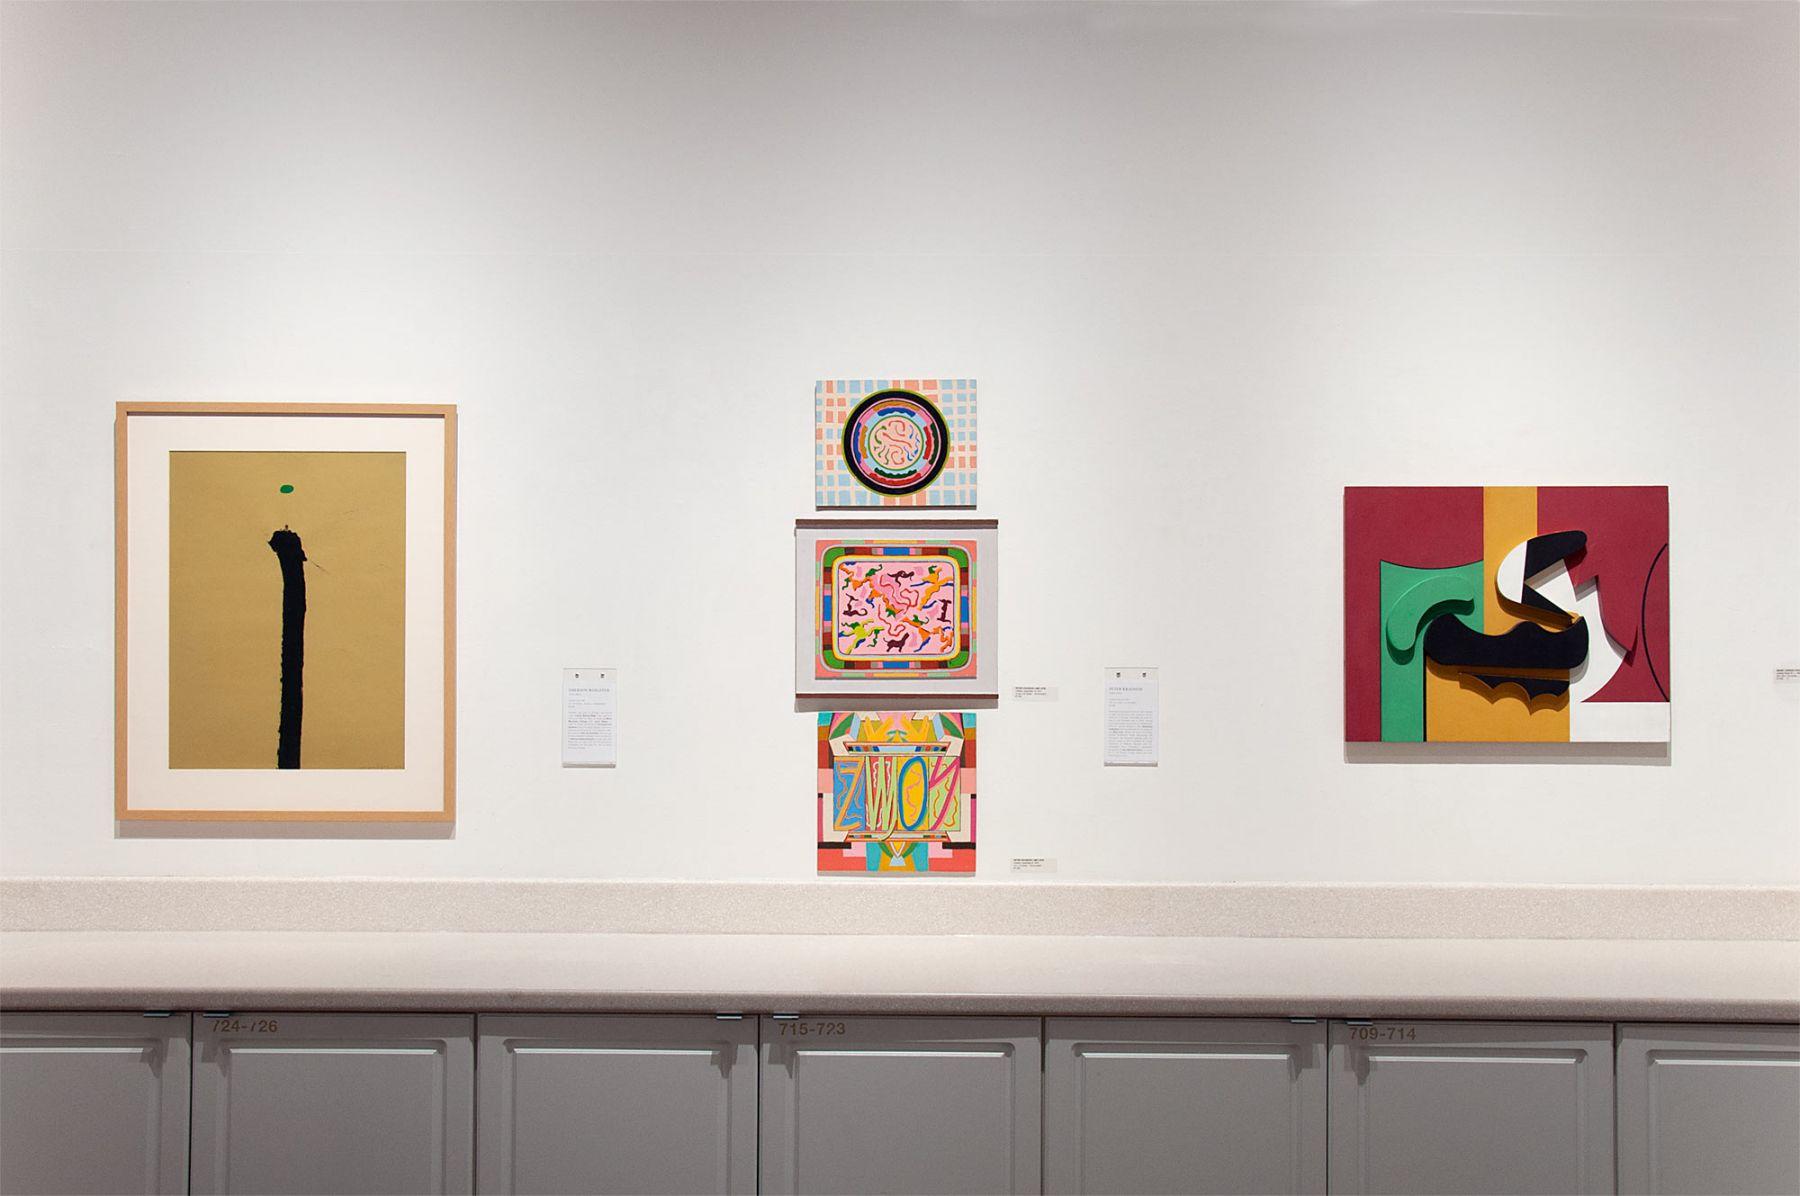 Installation photograph of CALIFORNIA BAUHAUS with Emerson Woelffer, Peter Krasnow, and Sidney Gordin